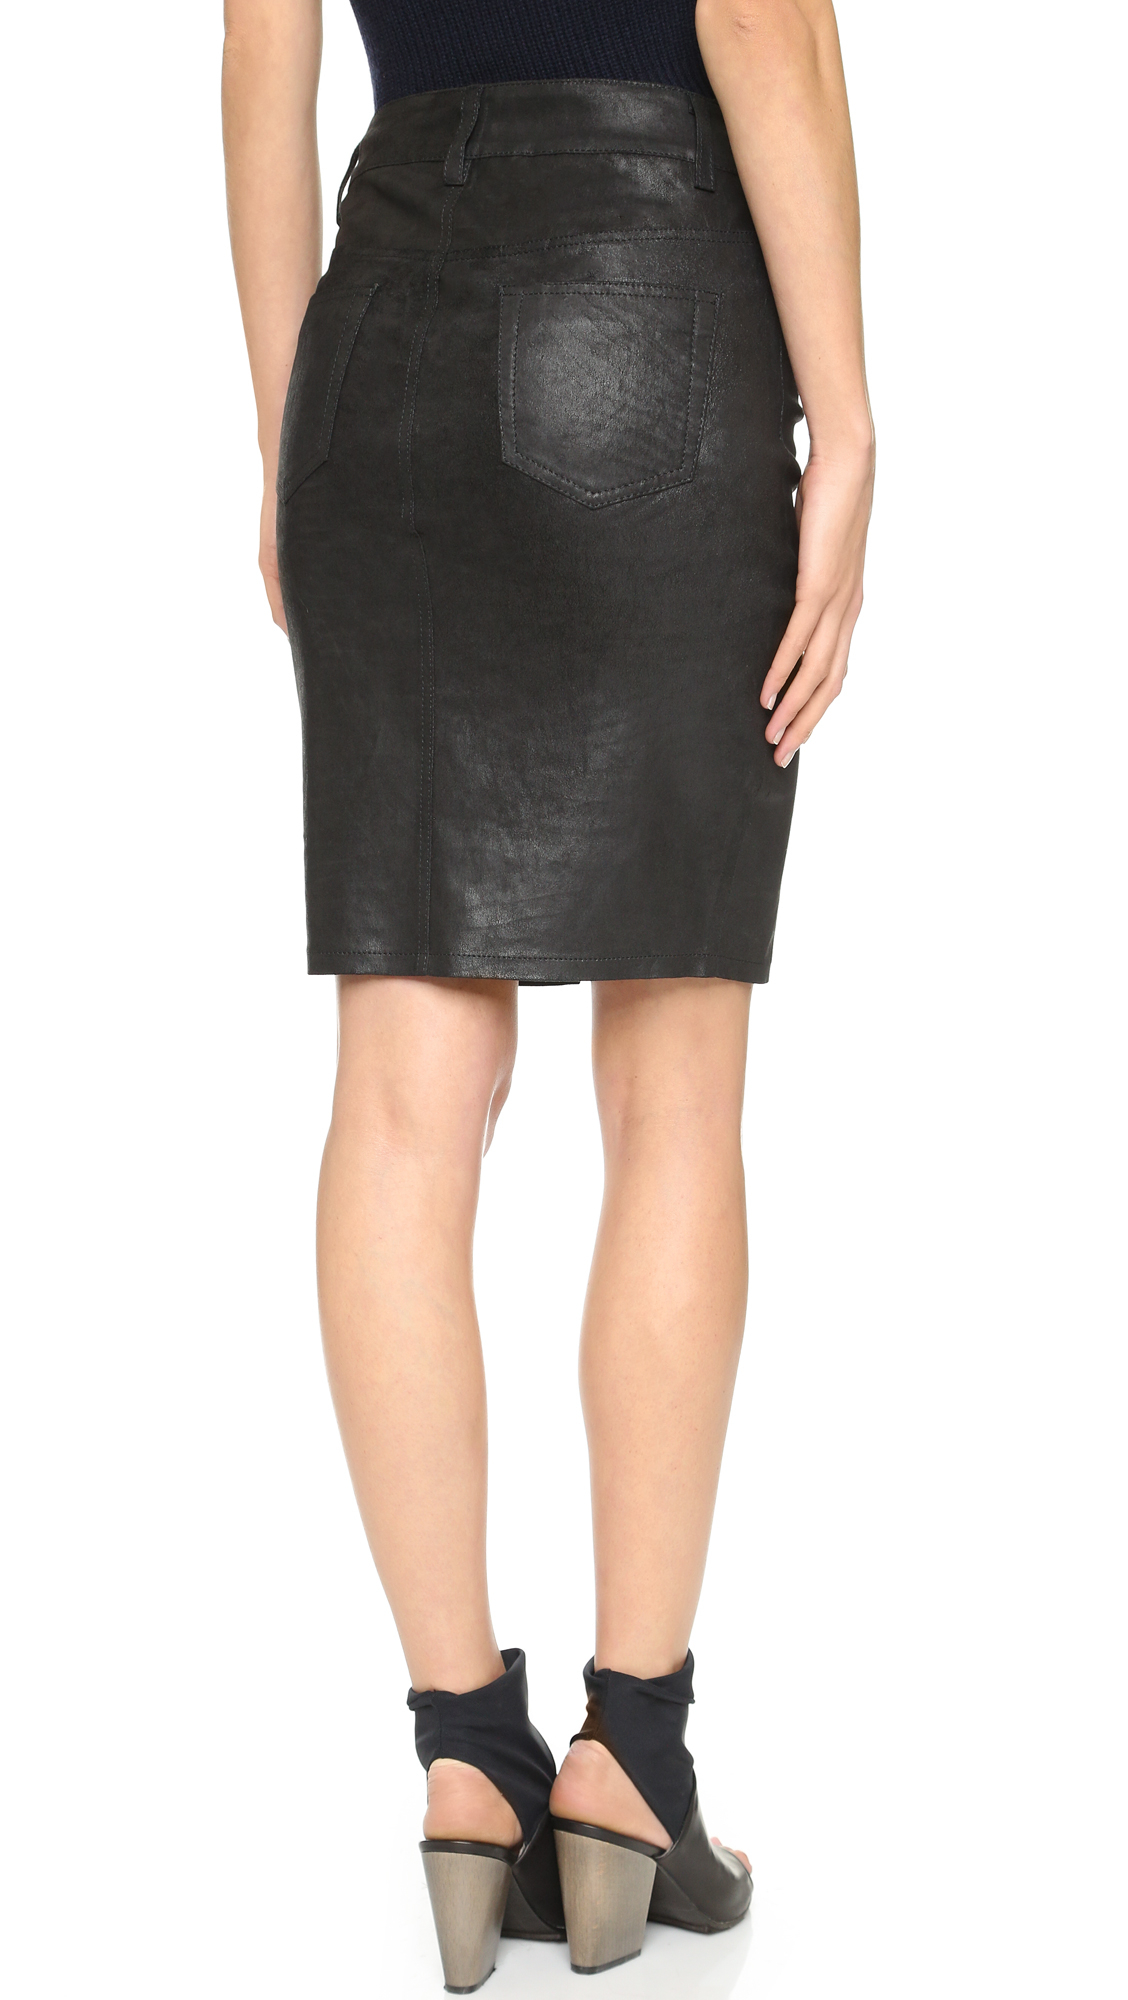 joe s slit leather pencil skirt in black lyst